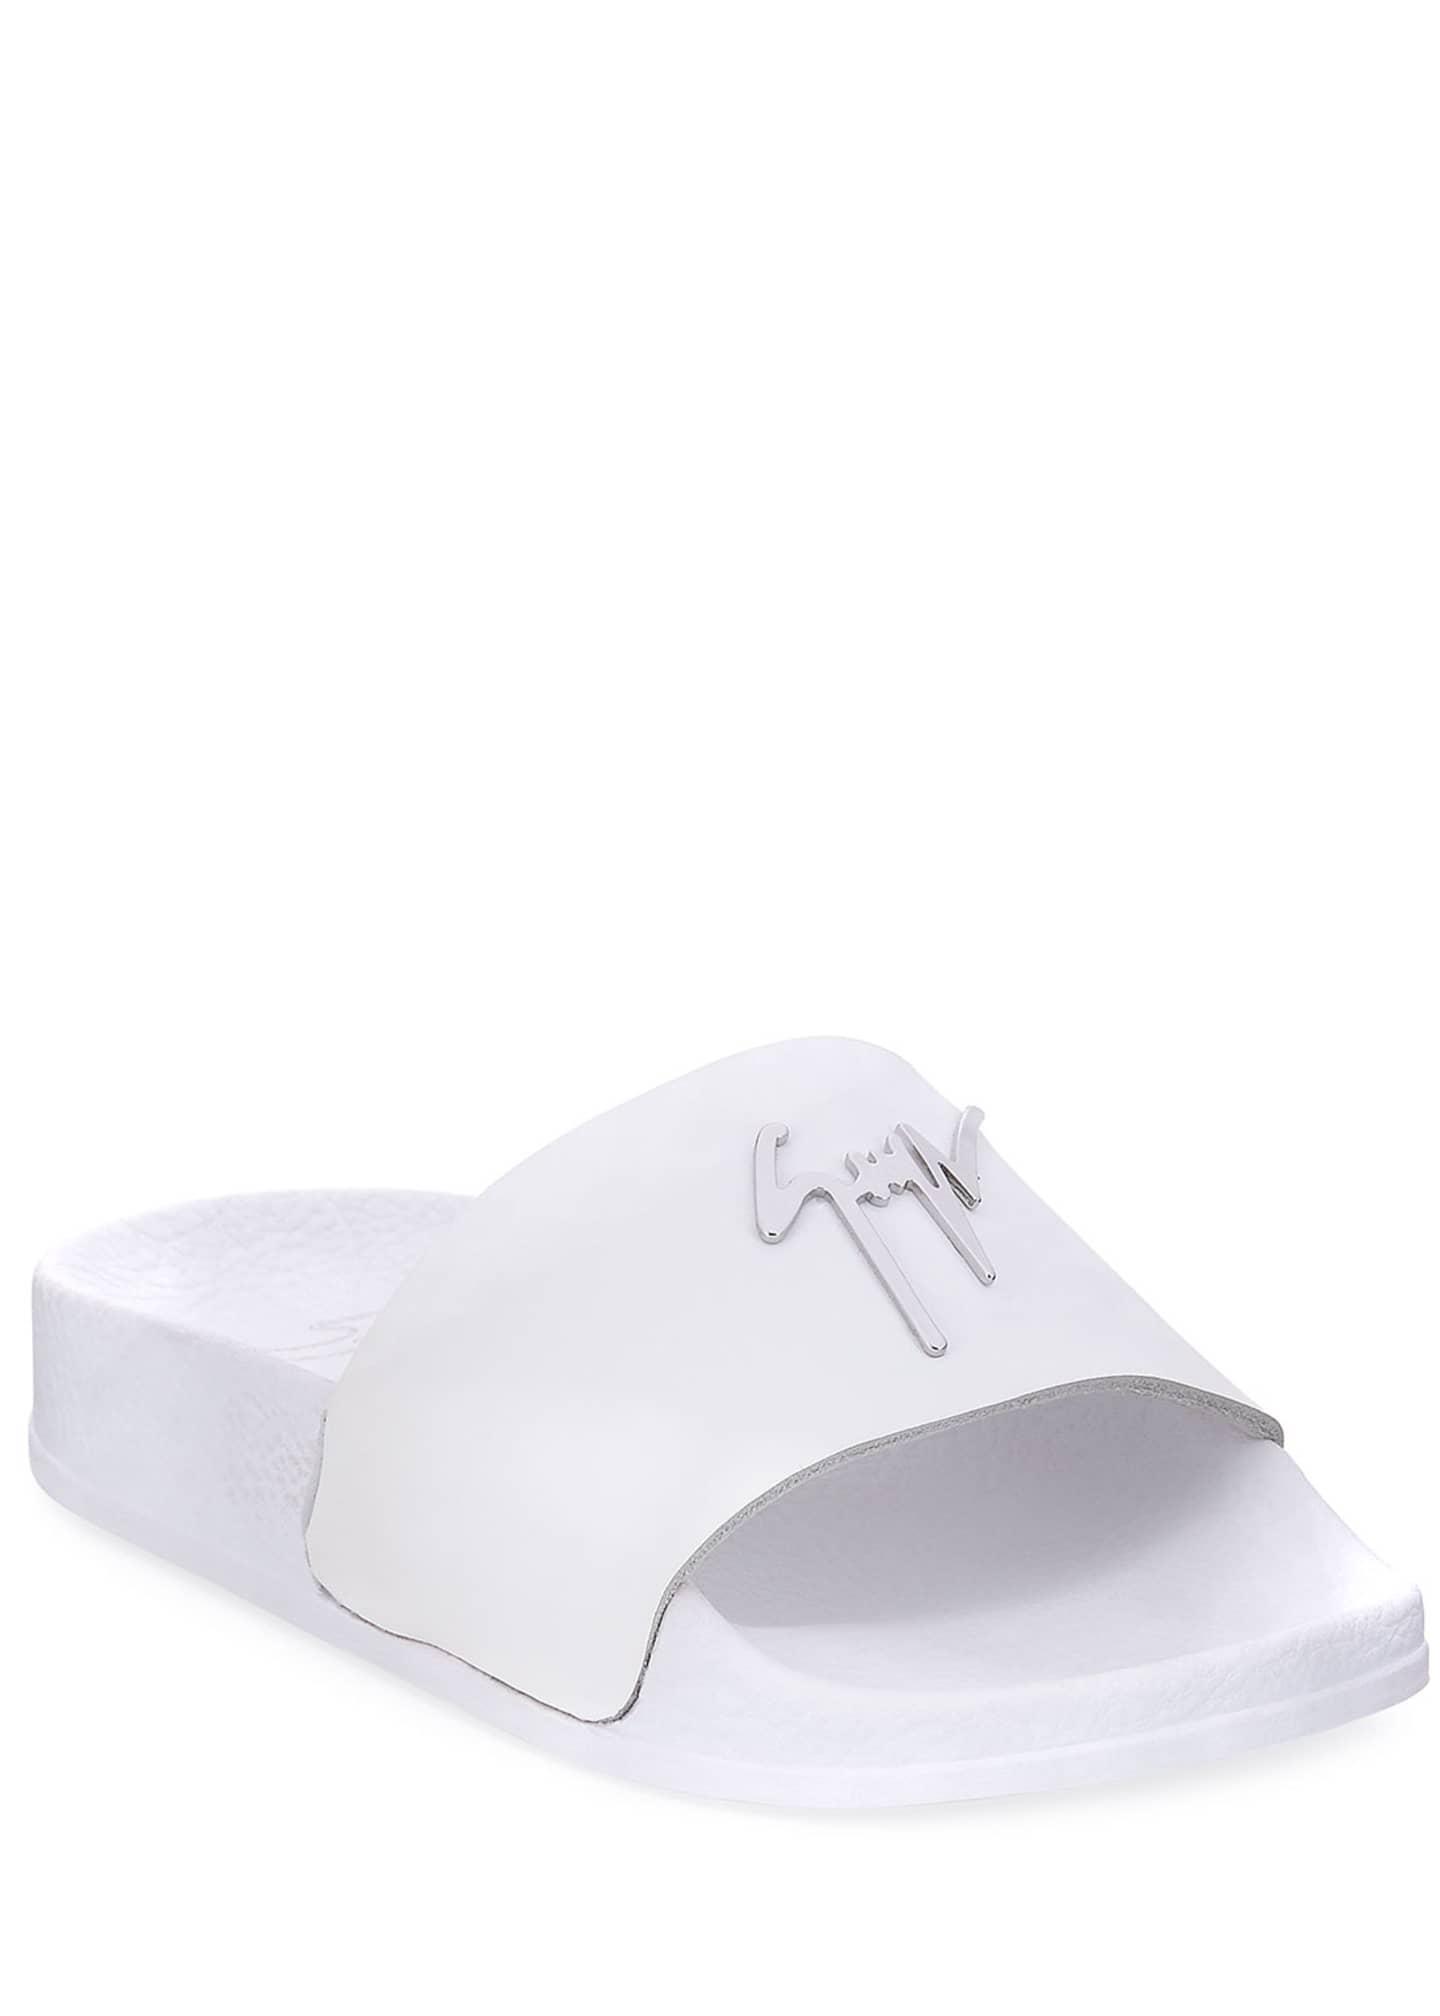 Giuseppe Zanotti Birel Leather Slide Sandal, White, Youth